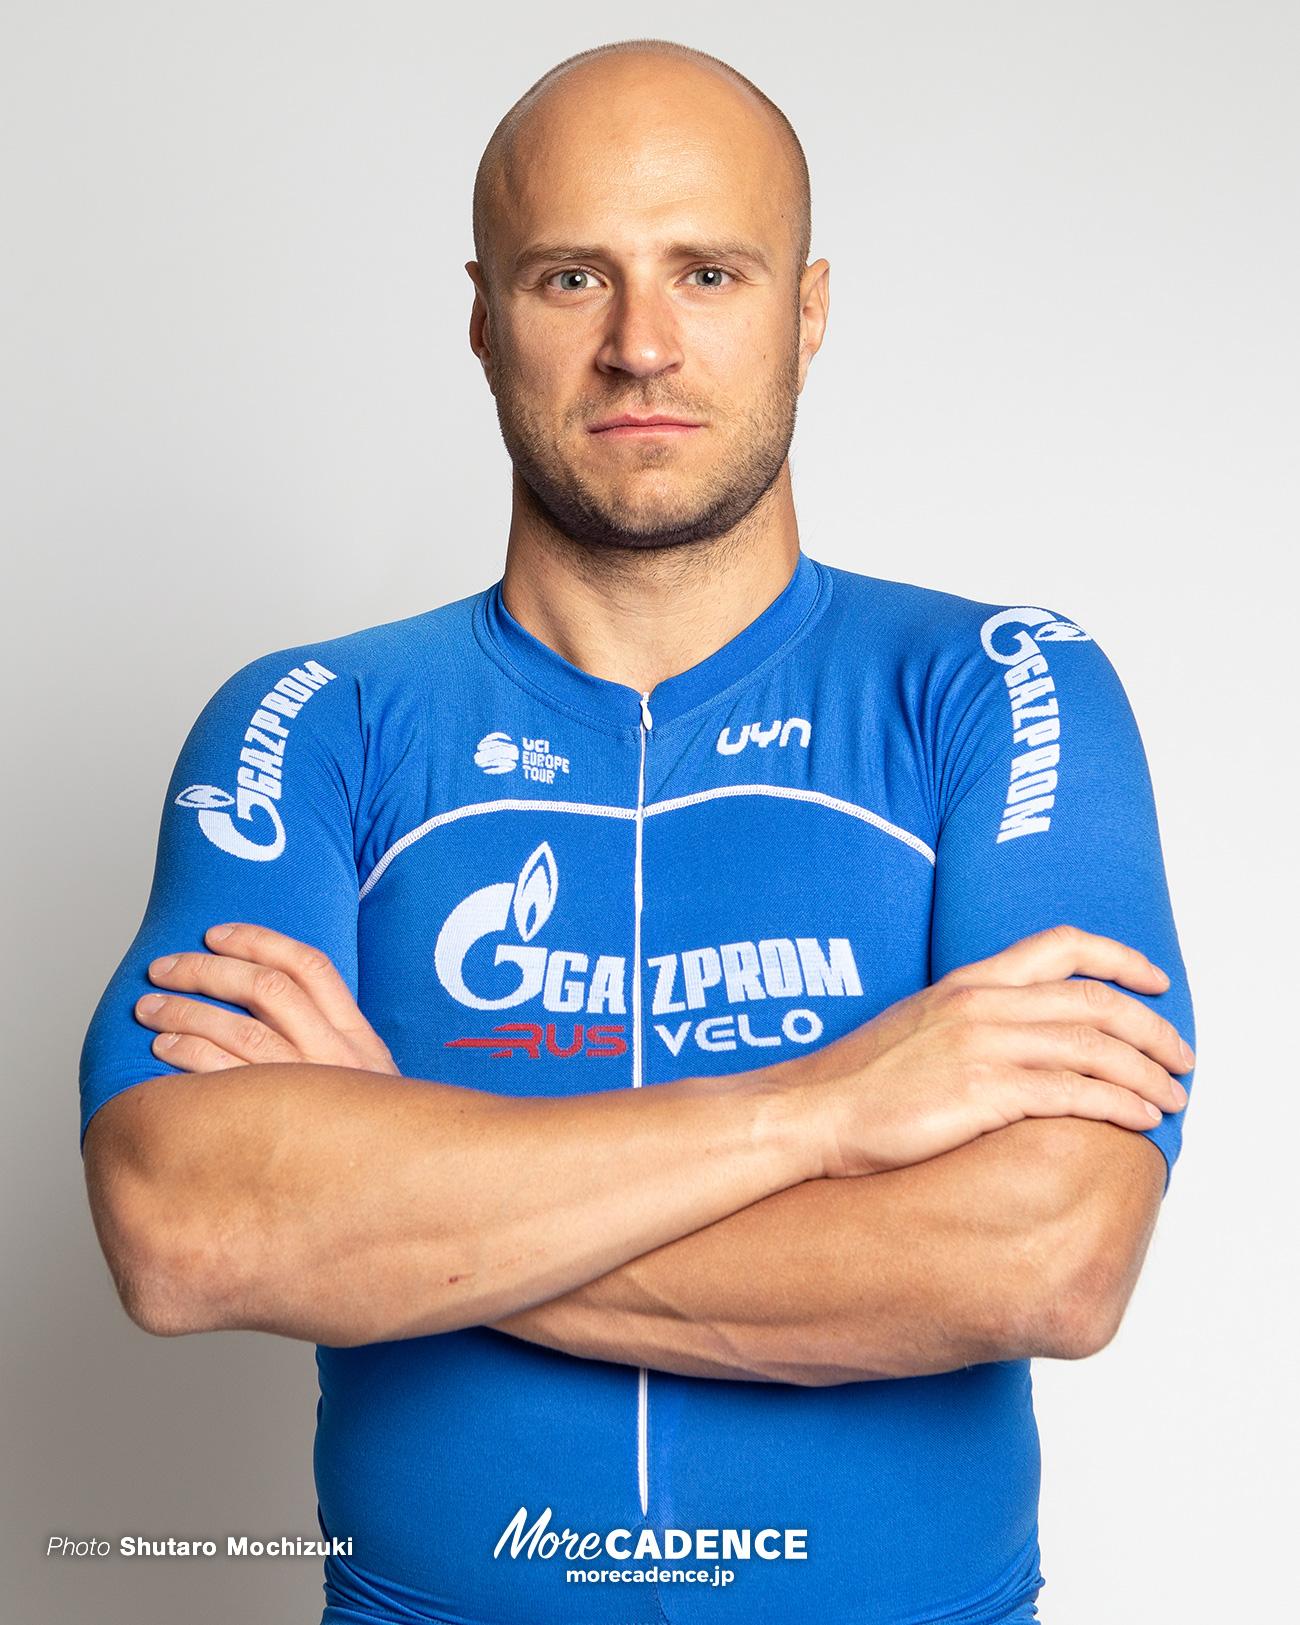 Denis Dmitriev